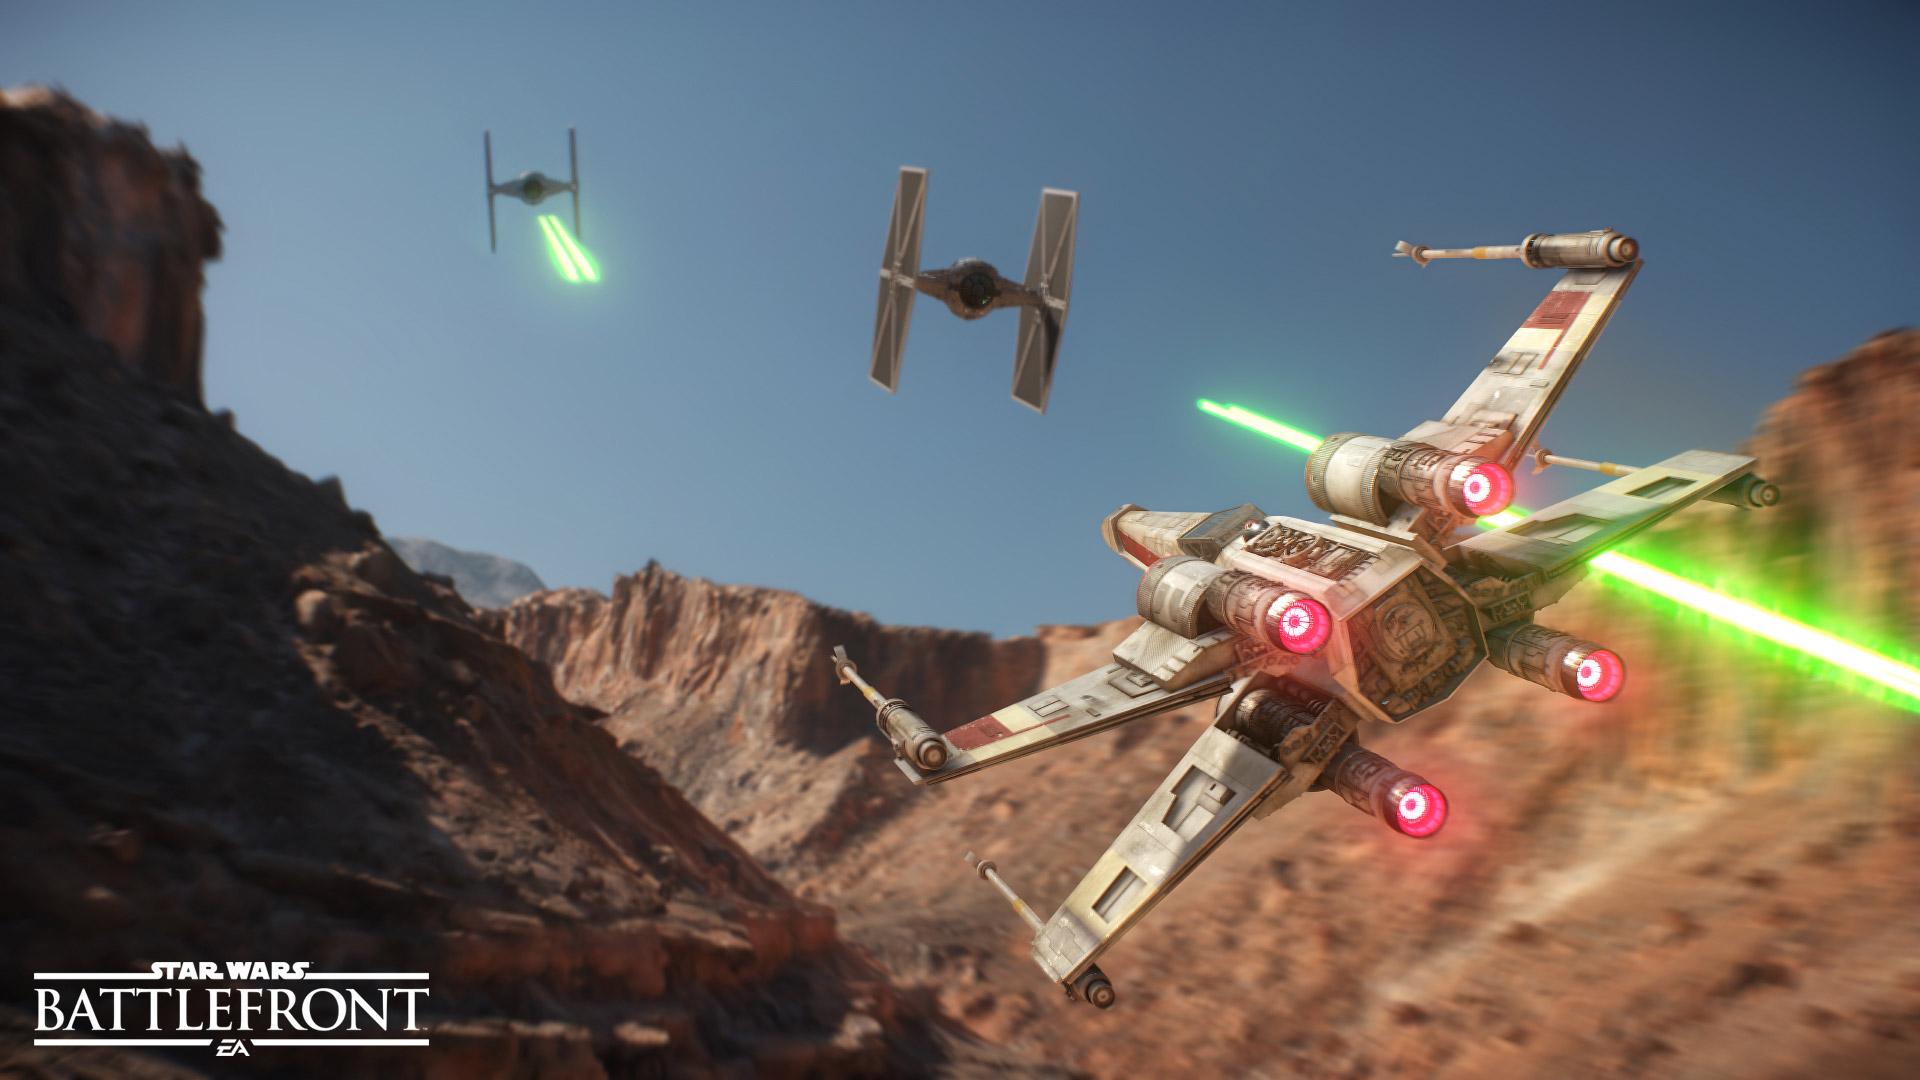 Star Wars: Battlefront Wallpaper in 1920x1080